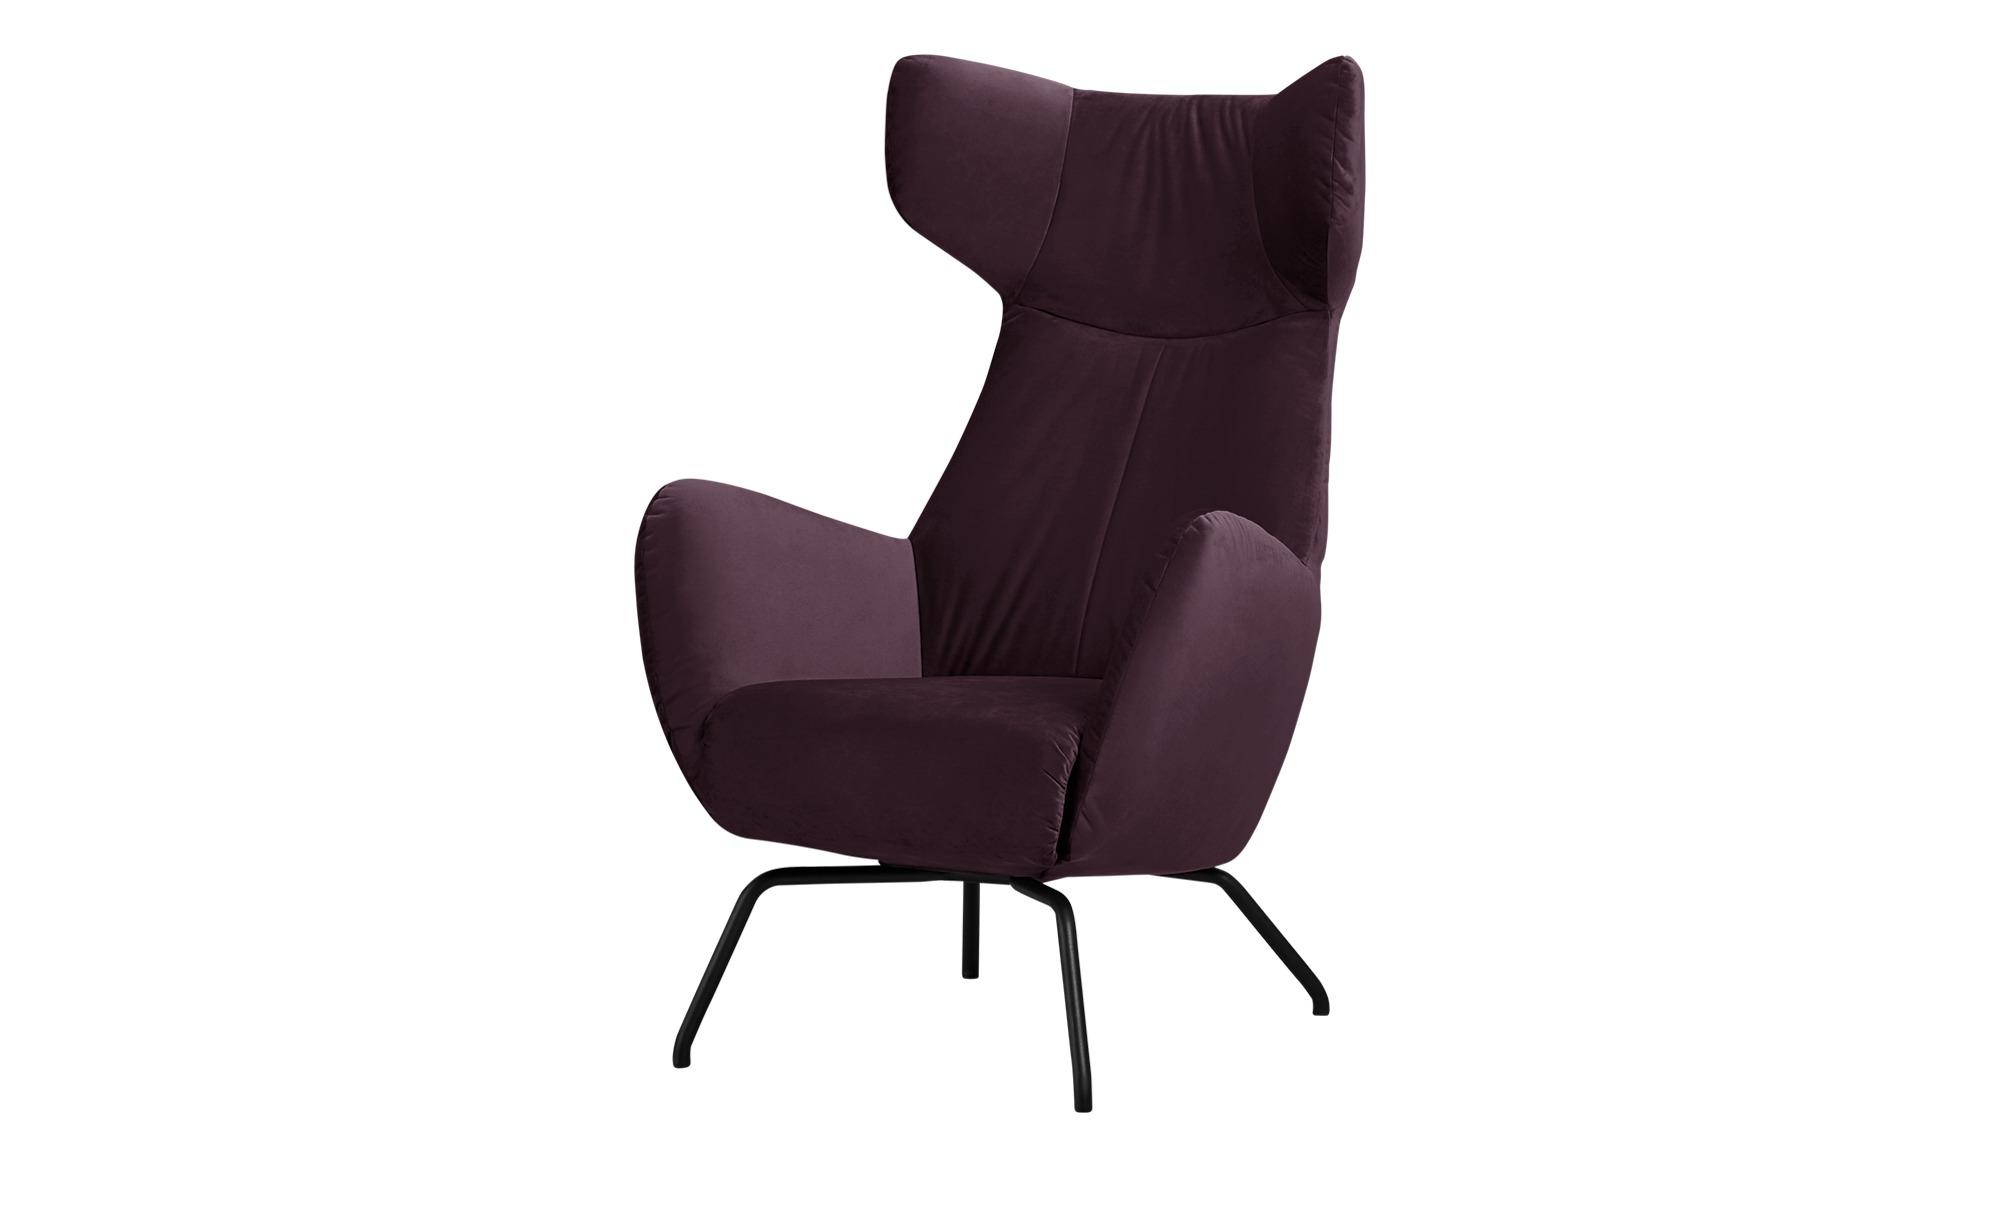 pop Sessel  Corelli ¦ lila/violett ¦ Maße (cm): B: 79 H: 117 T: 82 Polstermöbel > Sessel > Polstersessel - Höffner